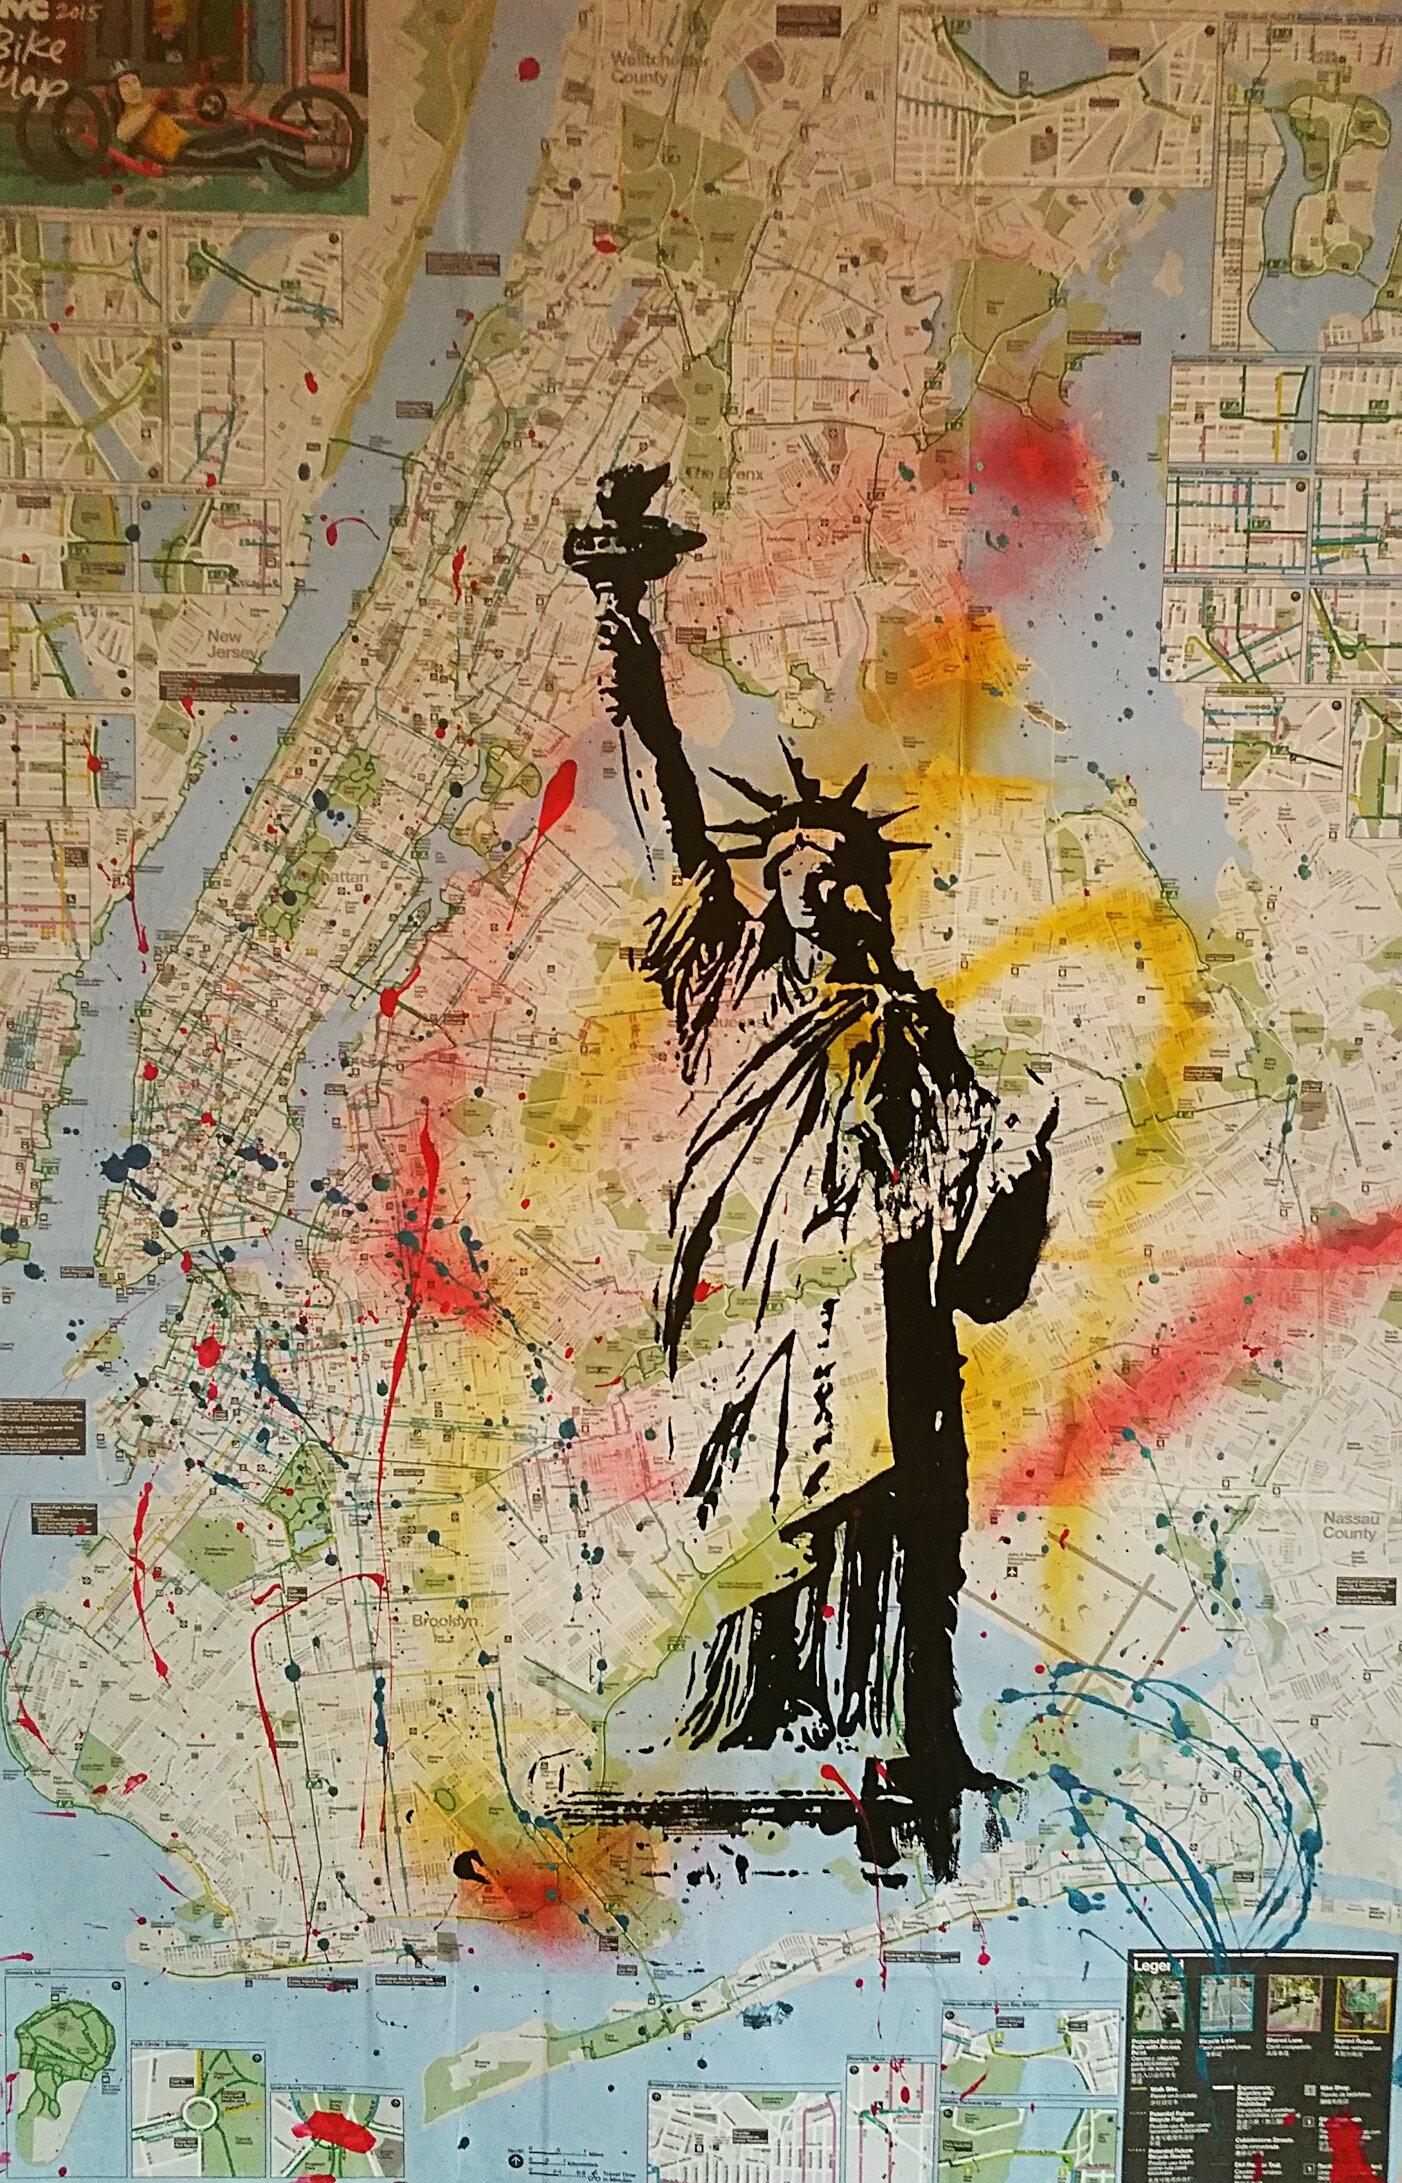 City Bike New York Map on